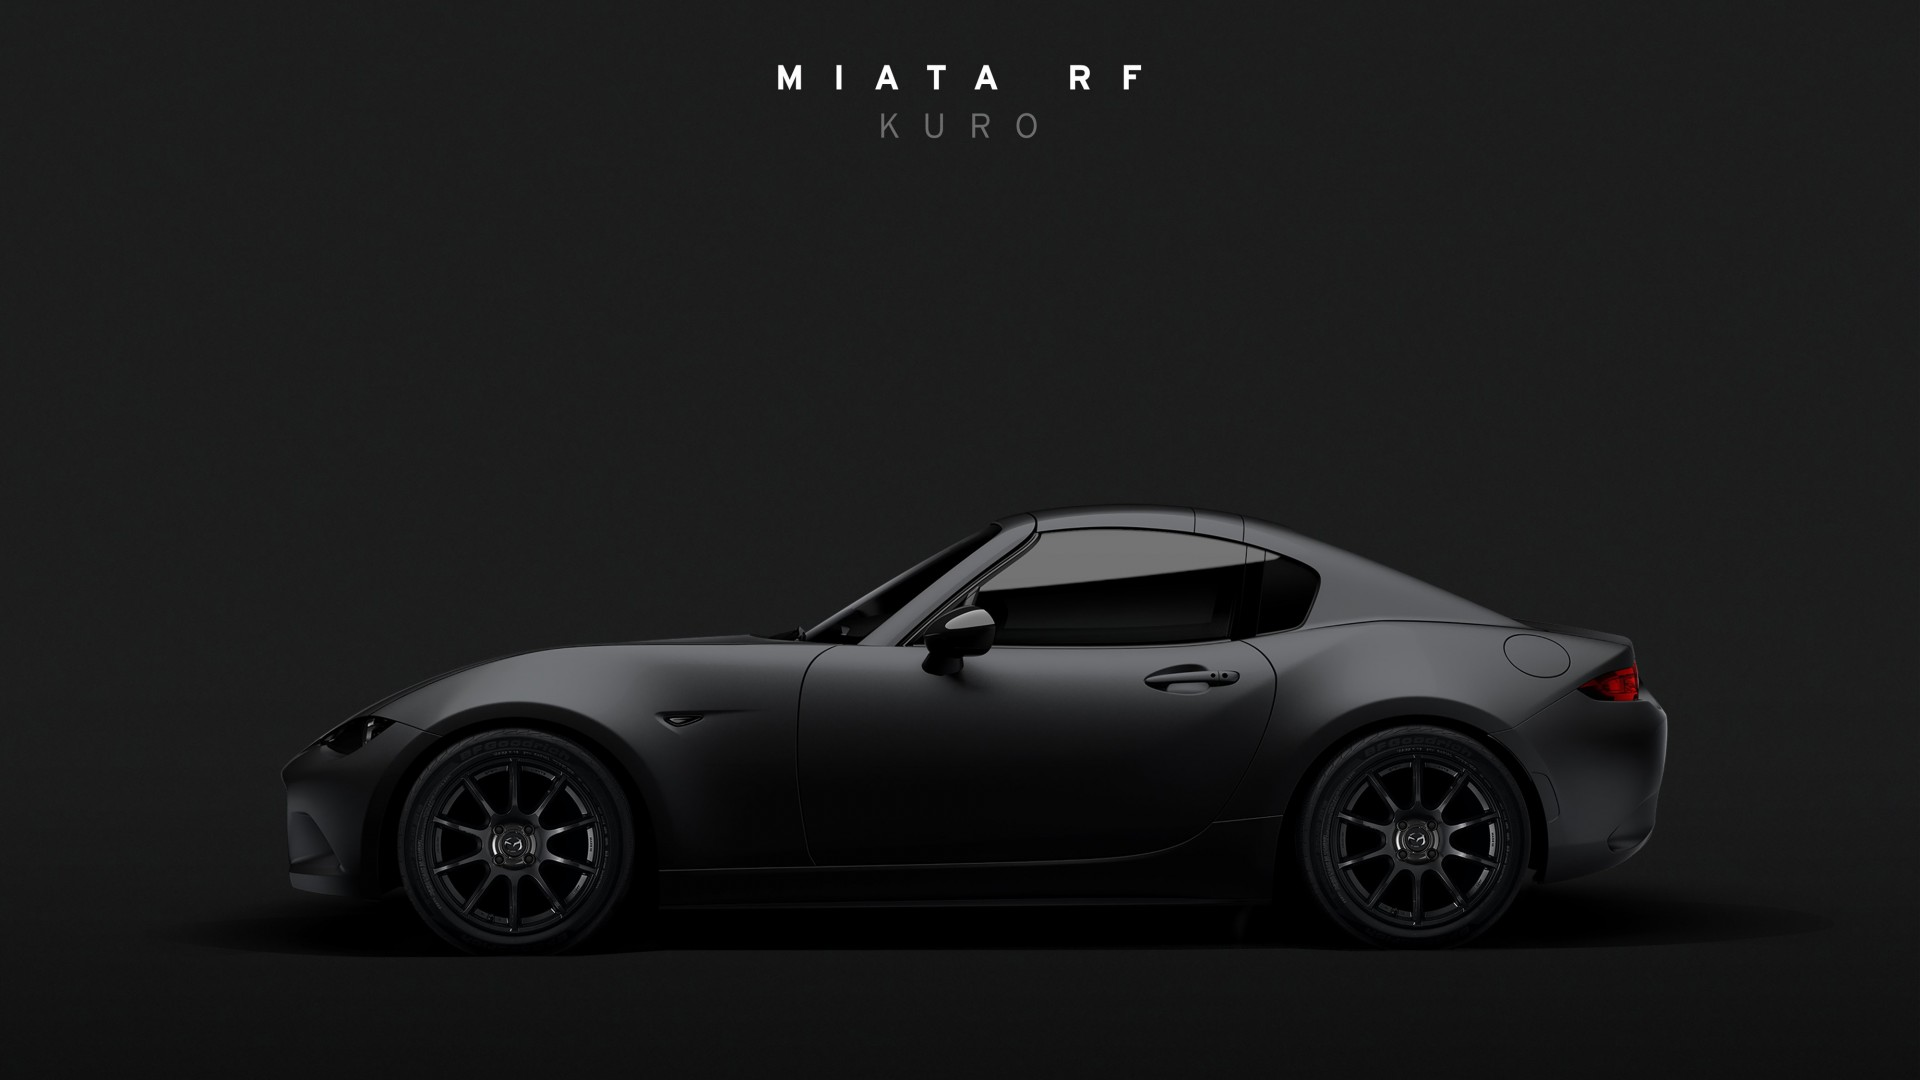 2017 Mazda Mx 5 Miata Rf Roadster Wallpaper Hd Car